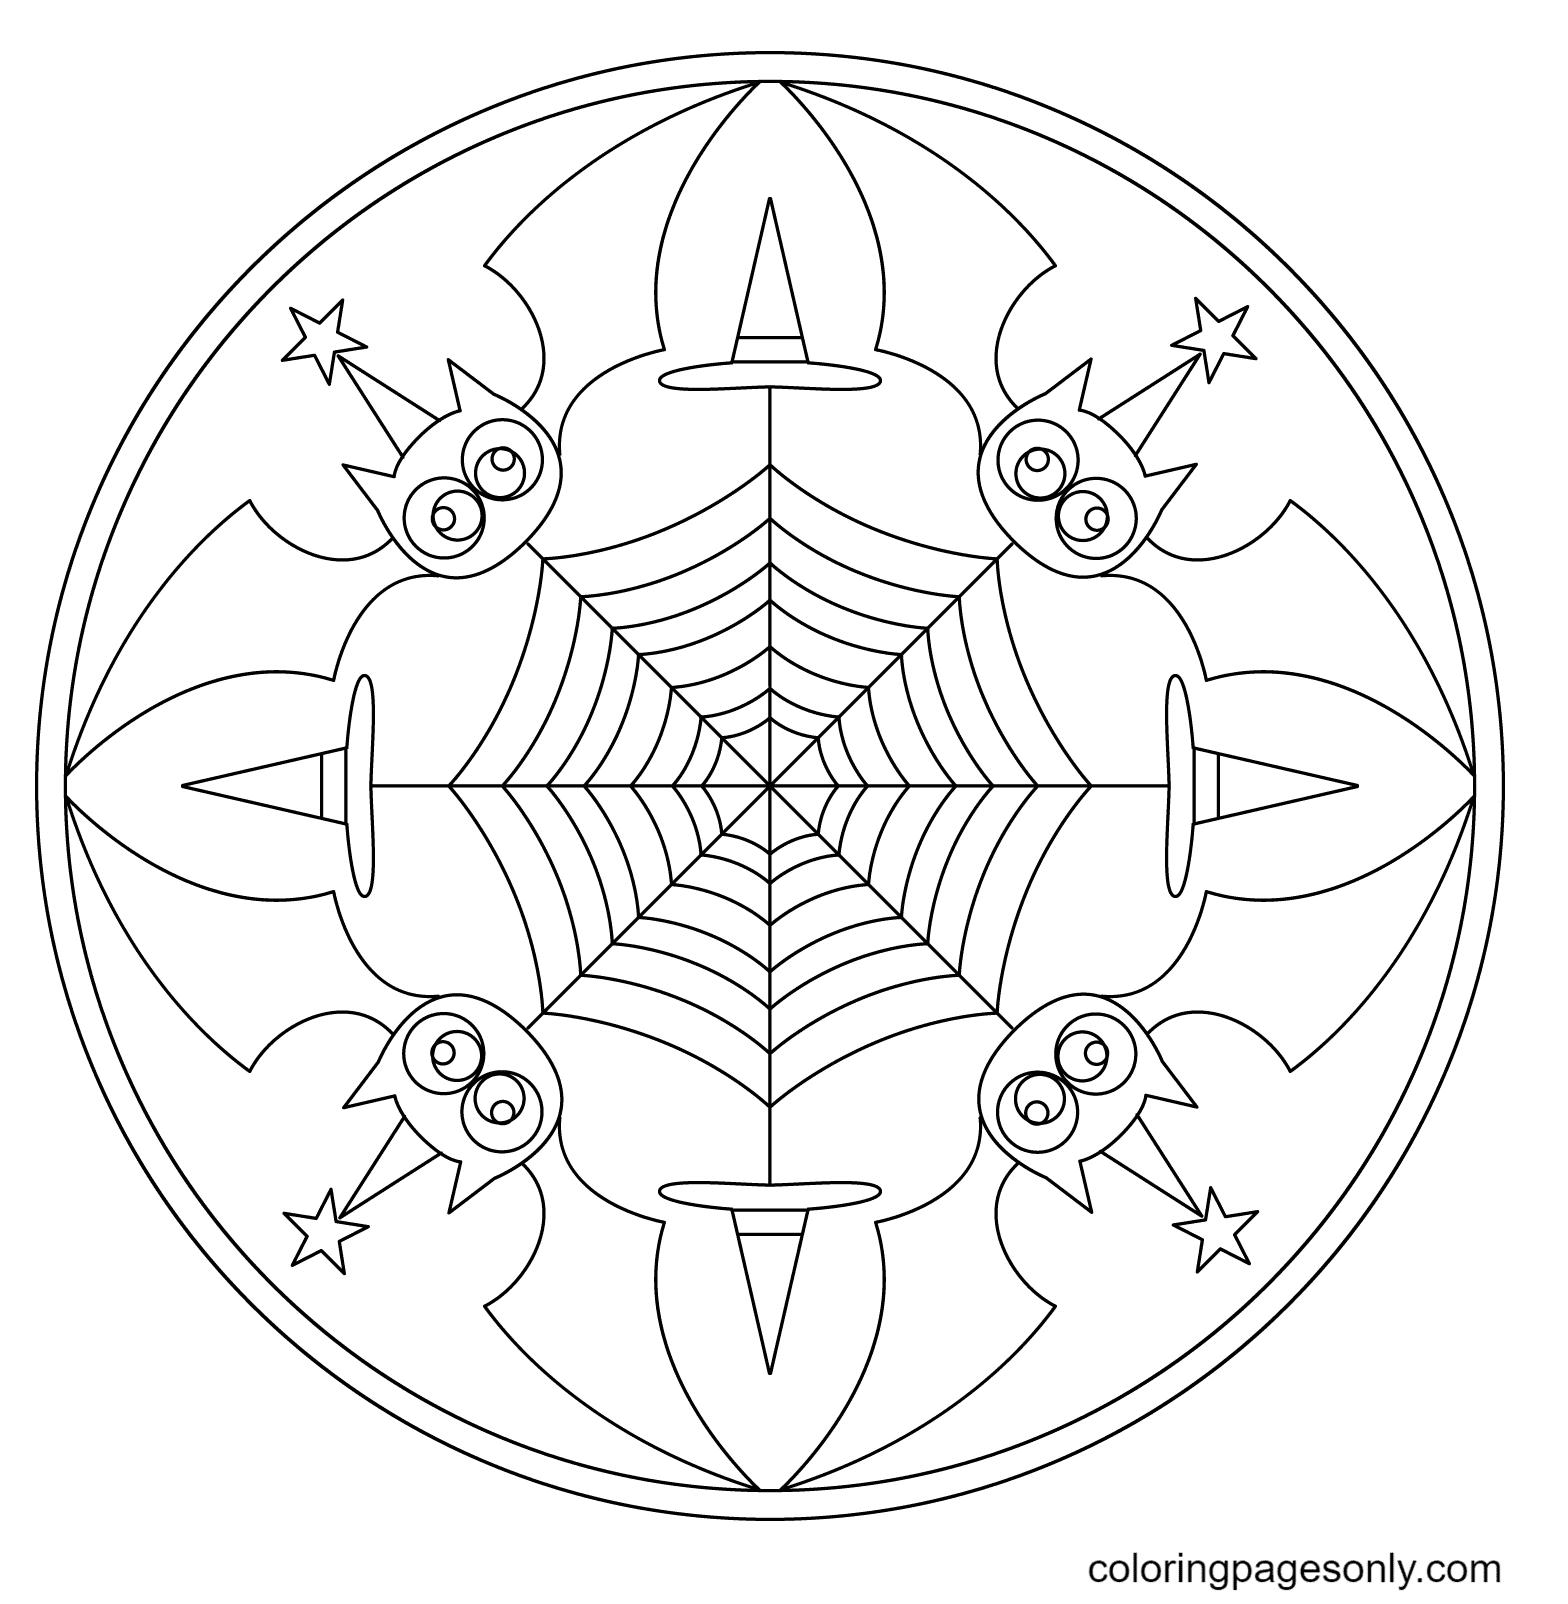 Halloween Mandala with Bats Coloring Page